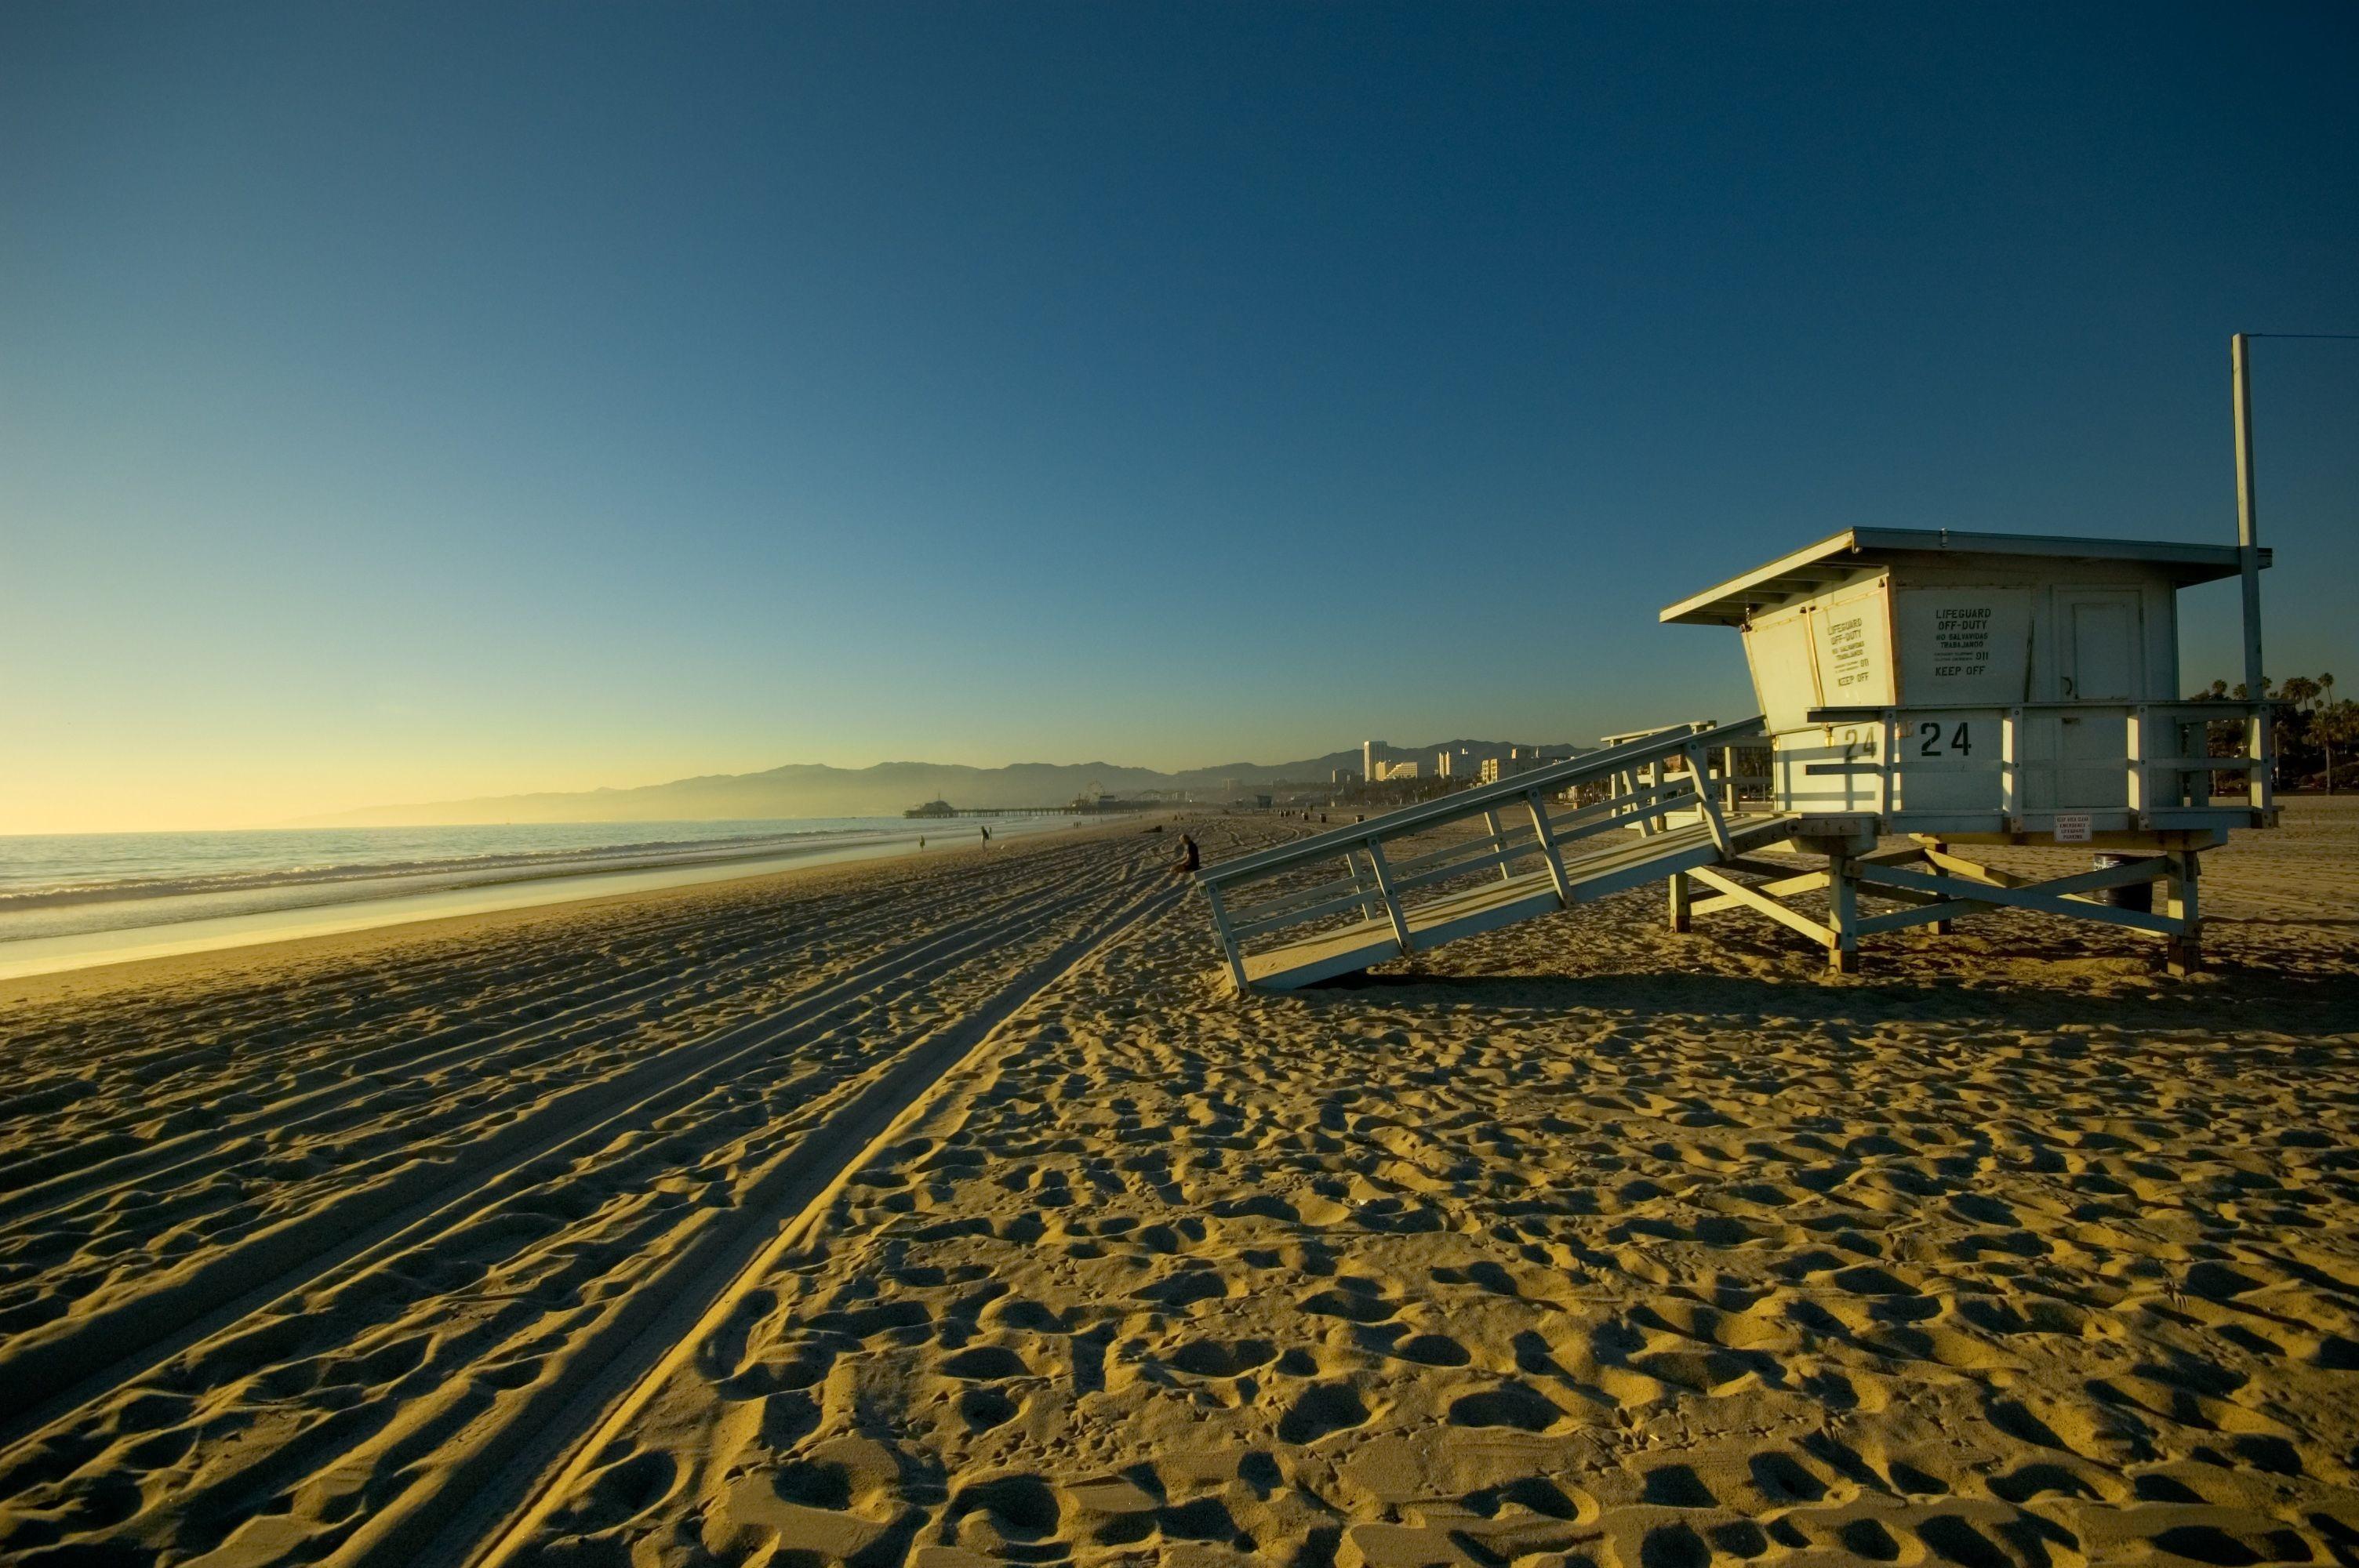 Venice Beach California Wallpaper 67 images 3008x2000